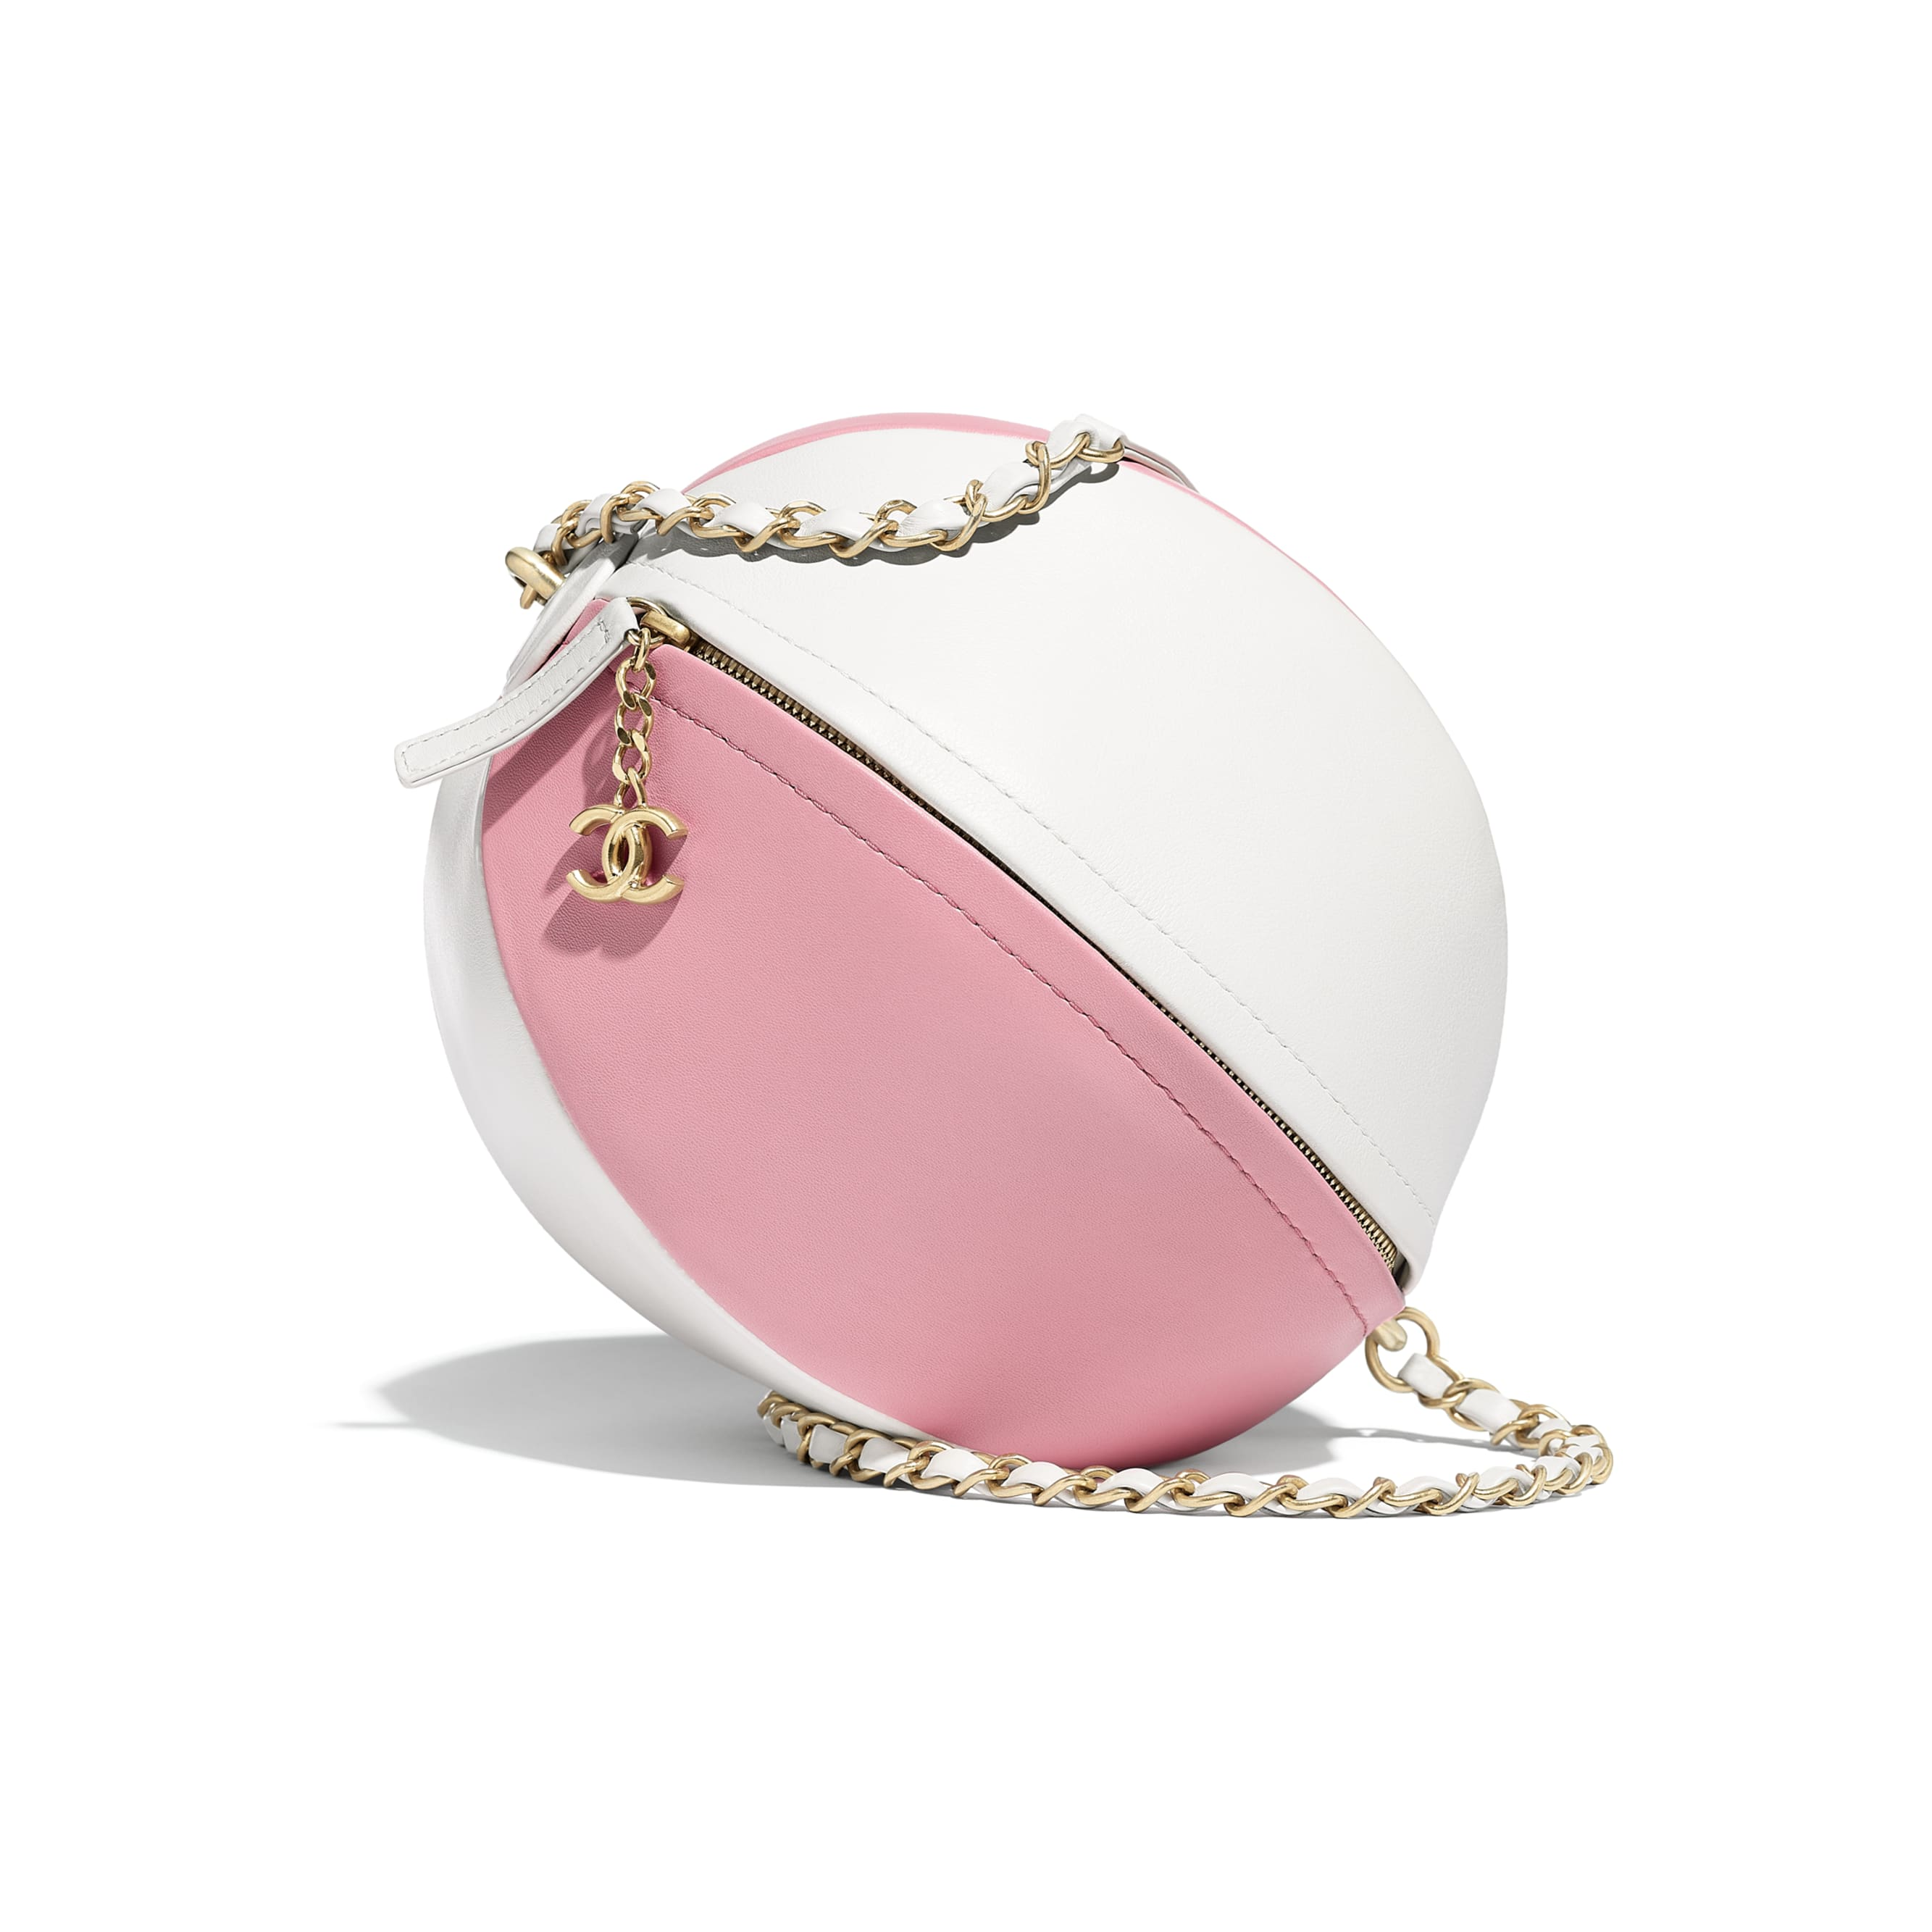 0946b7eb679b beach-ball-handbag-white-pink-calfskin-g